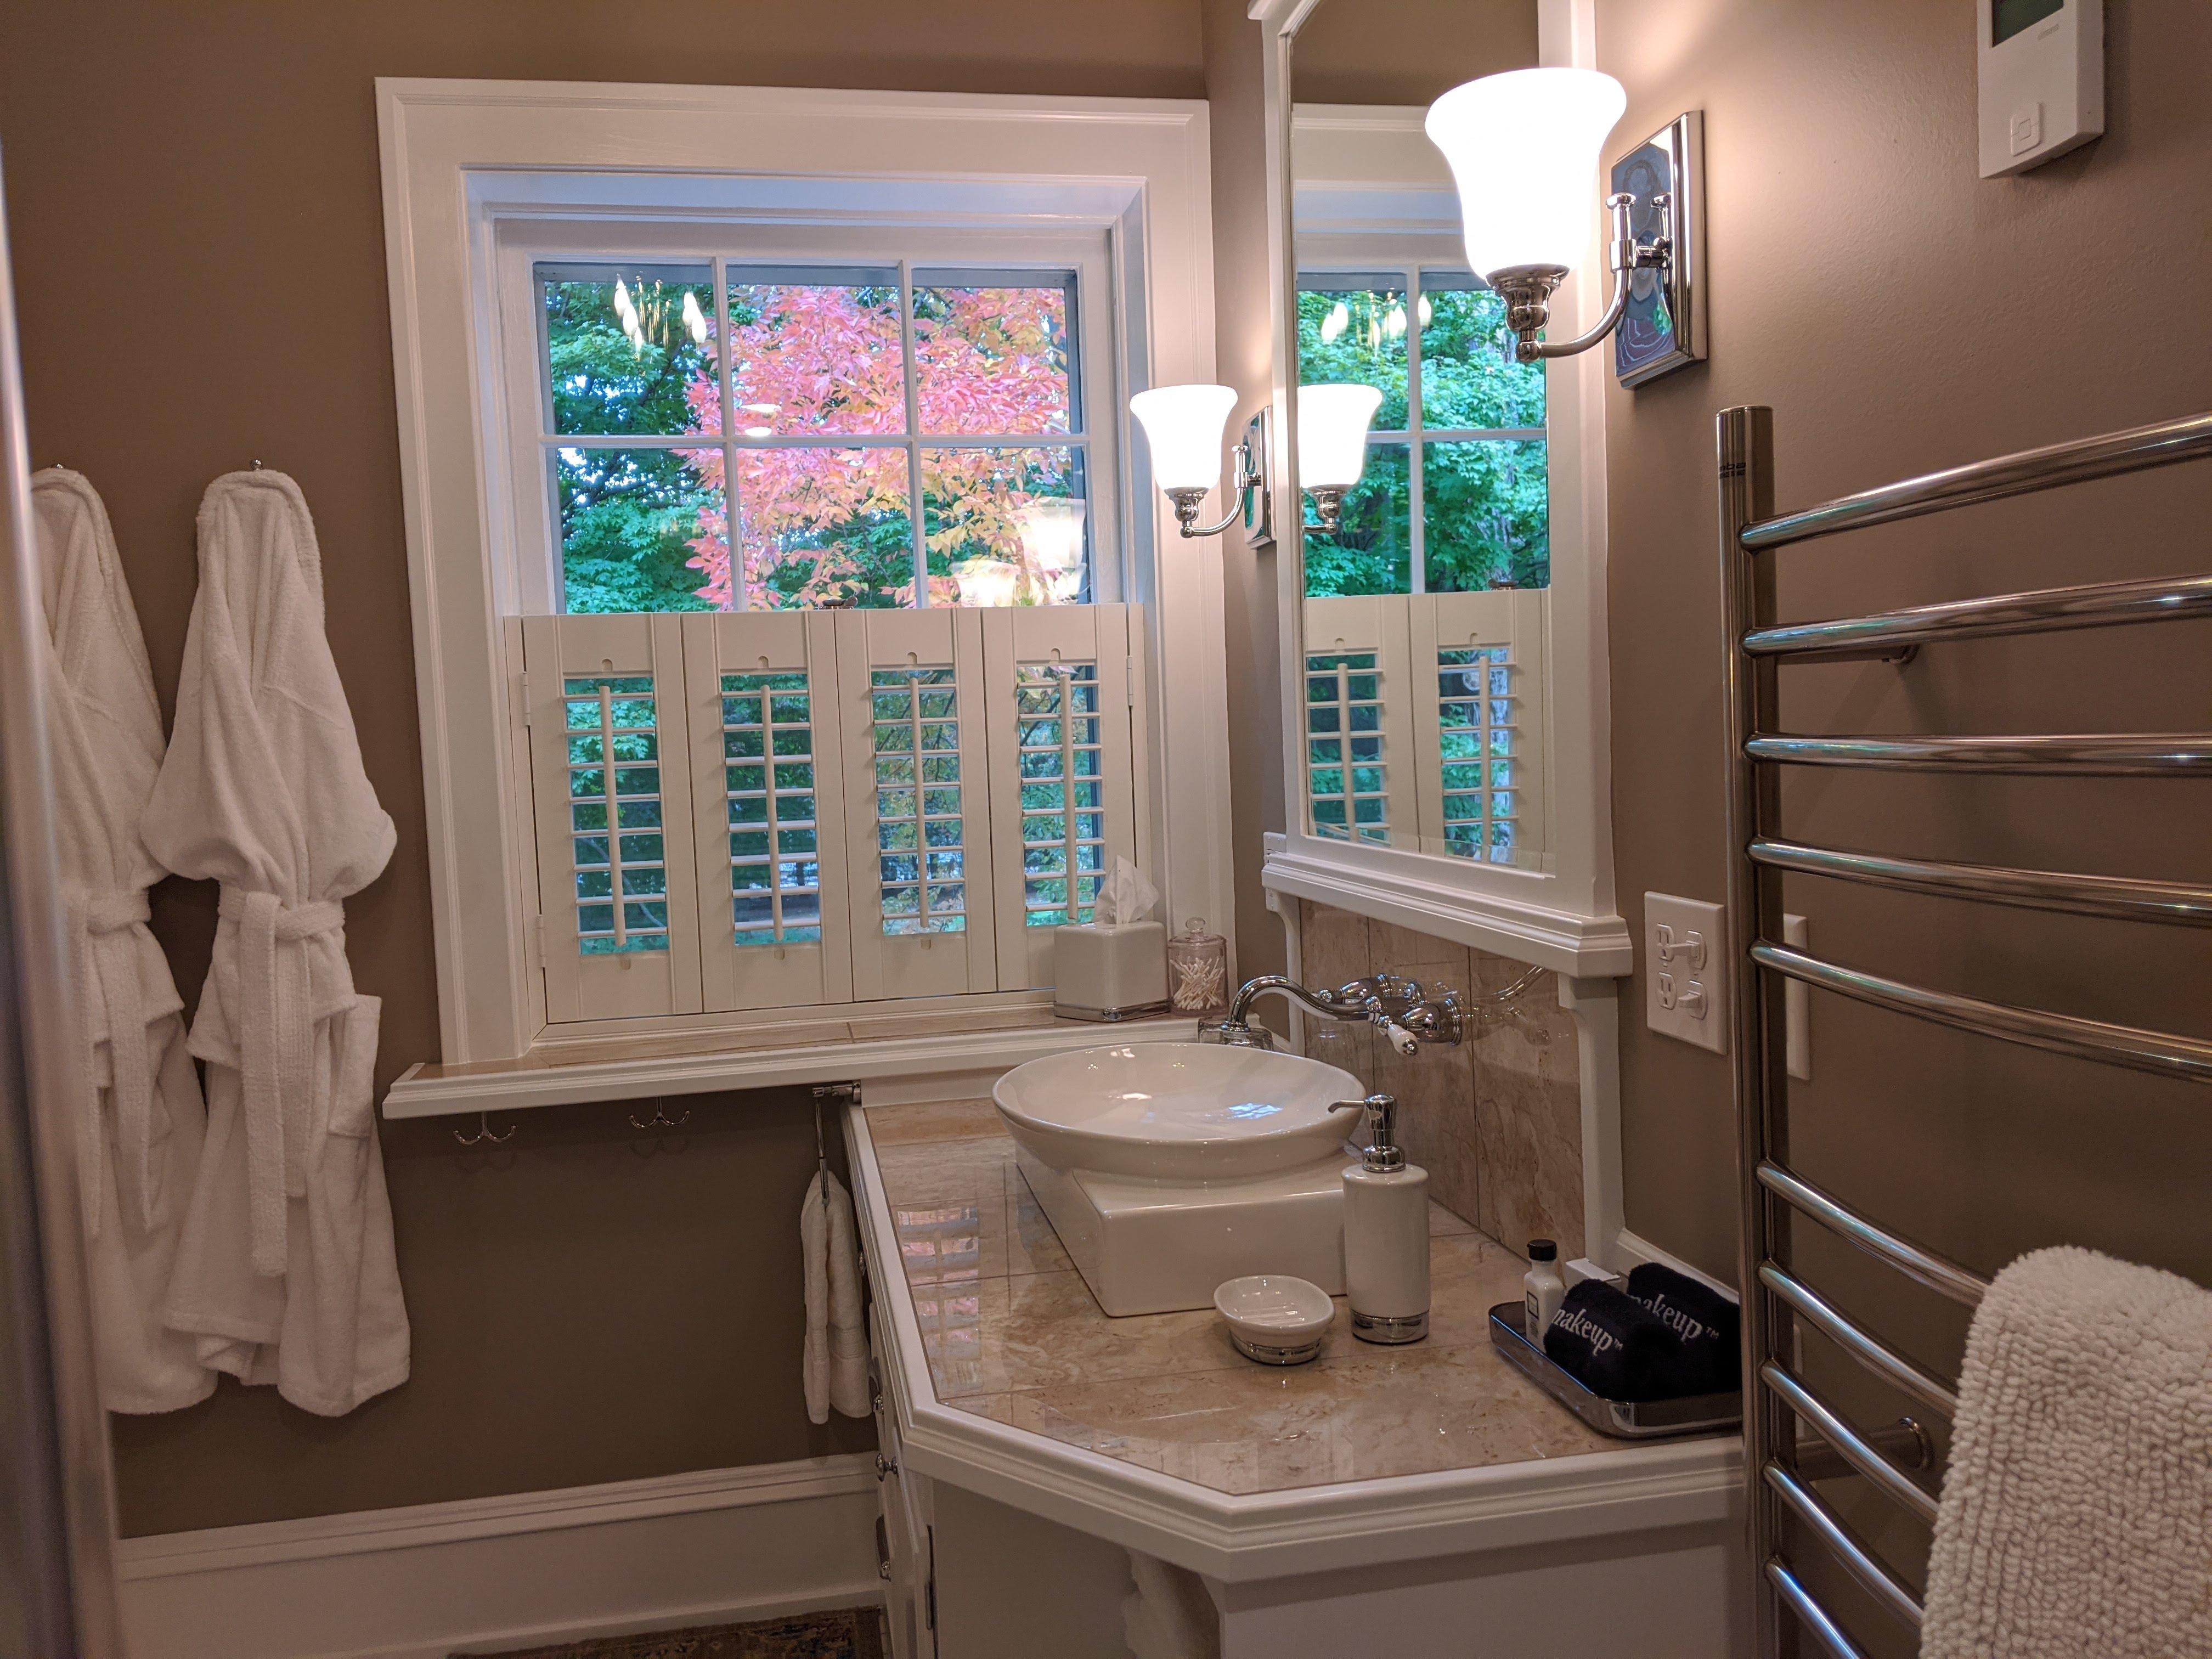 BrickInn Letchworth State Park State Wren Guestroom Bathroom Vanity